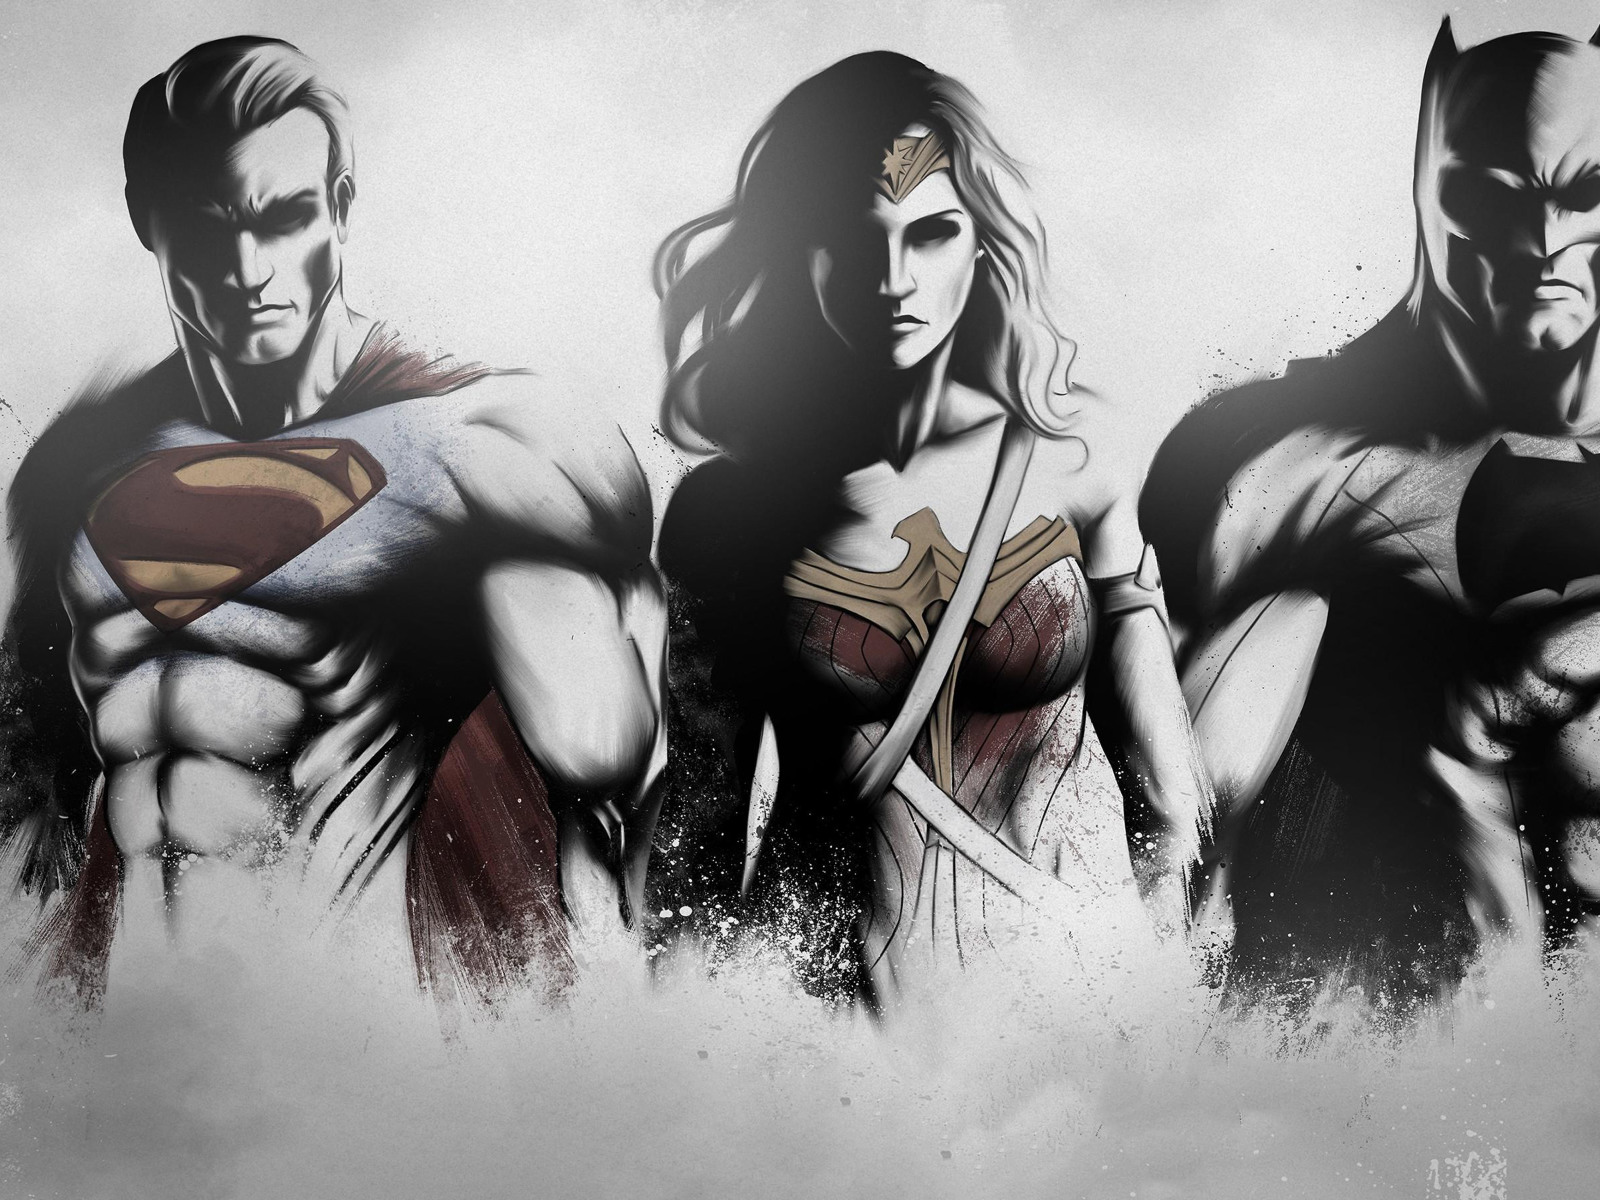 Wonder Woman 4k 8k Wallpapers: Superman Wonder Woman Batman Art Sketch, HD 4K Wallpaper